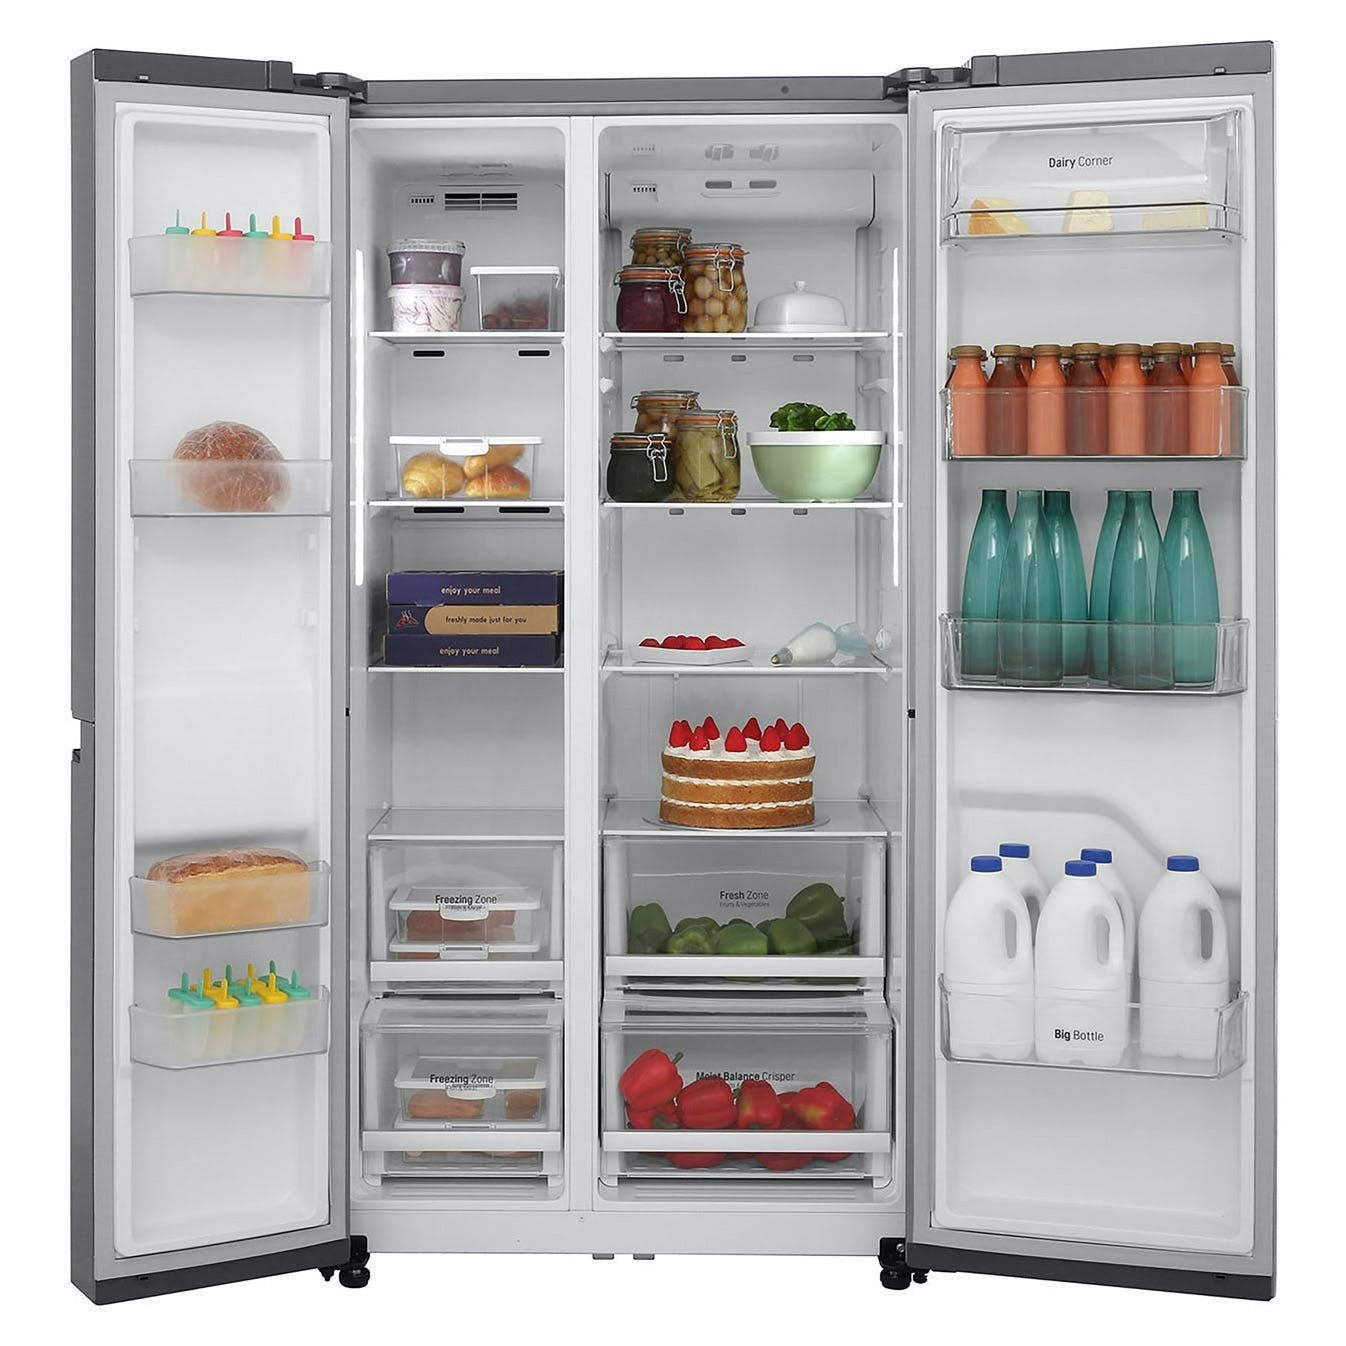 LG GSB760PZXV American Fridge Freezer in St/Steel, 1 79m A+ Rated